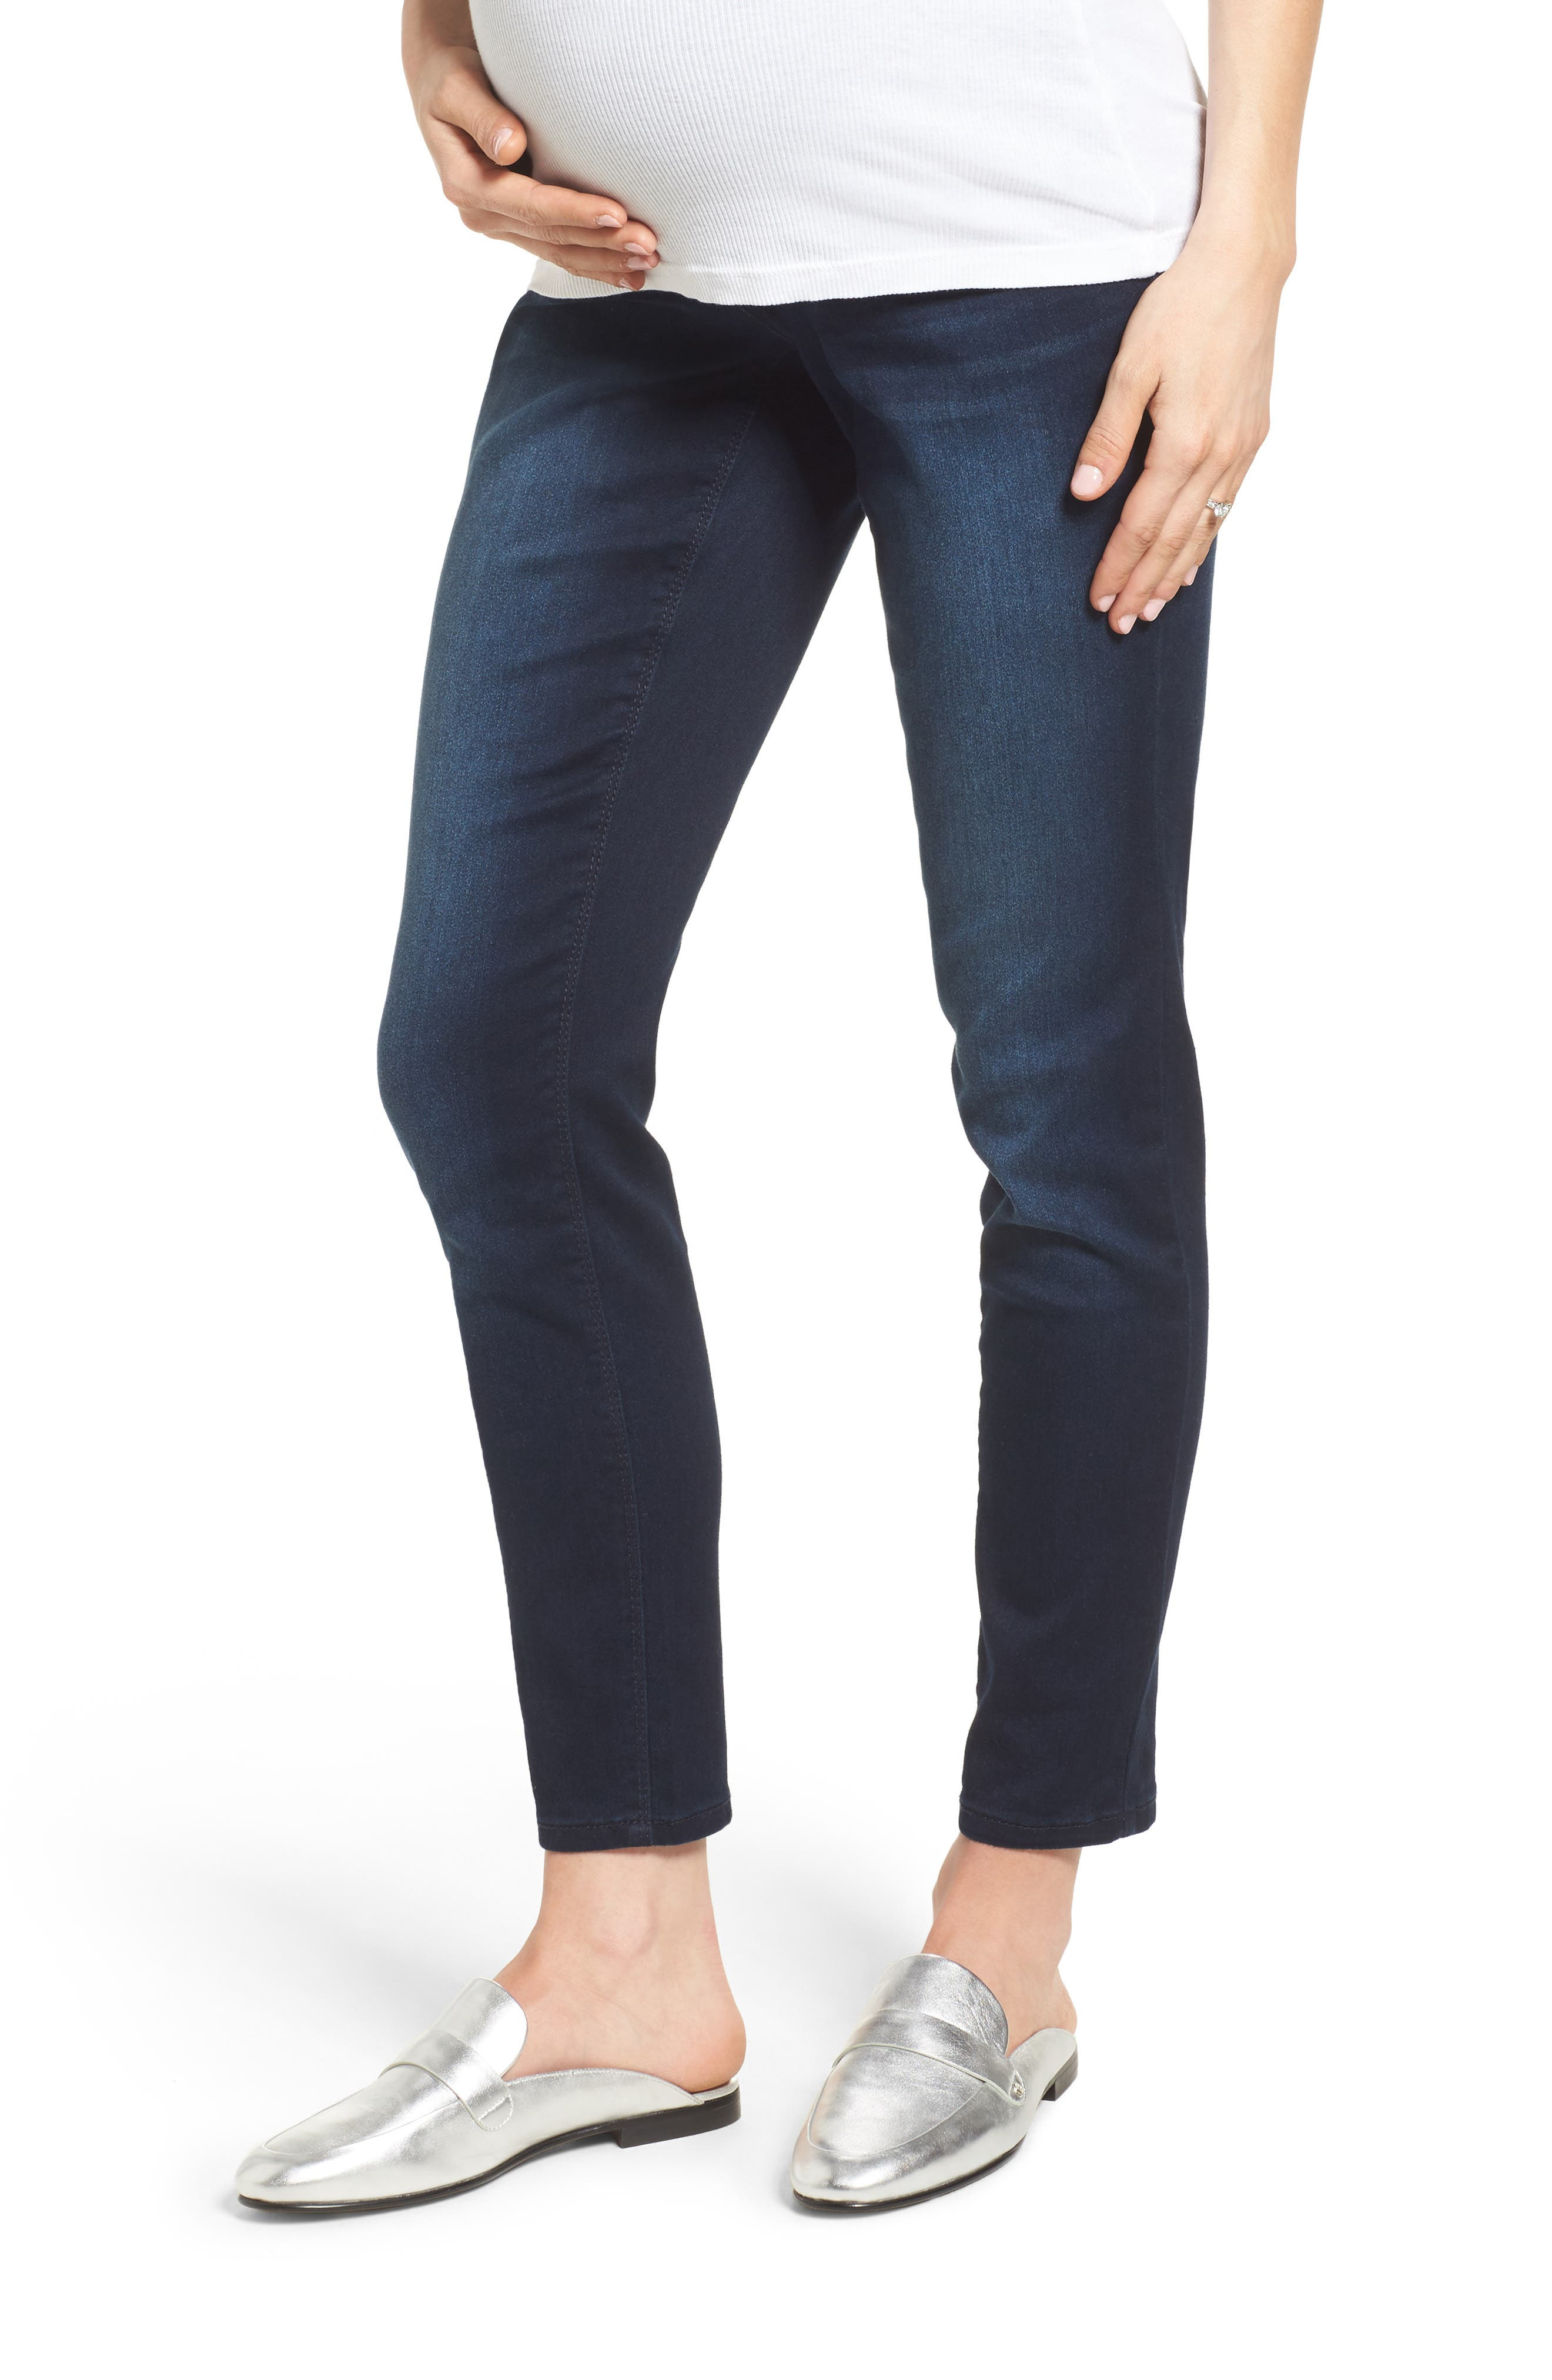 1822 DENIM Luxe Maternity Skinny Jeans